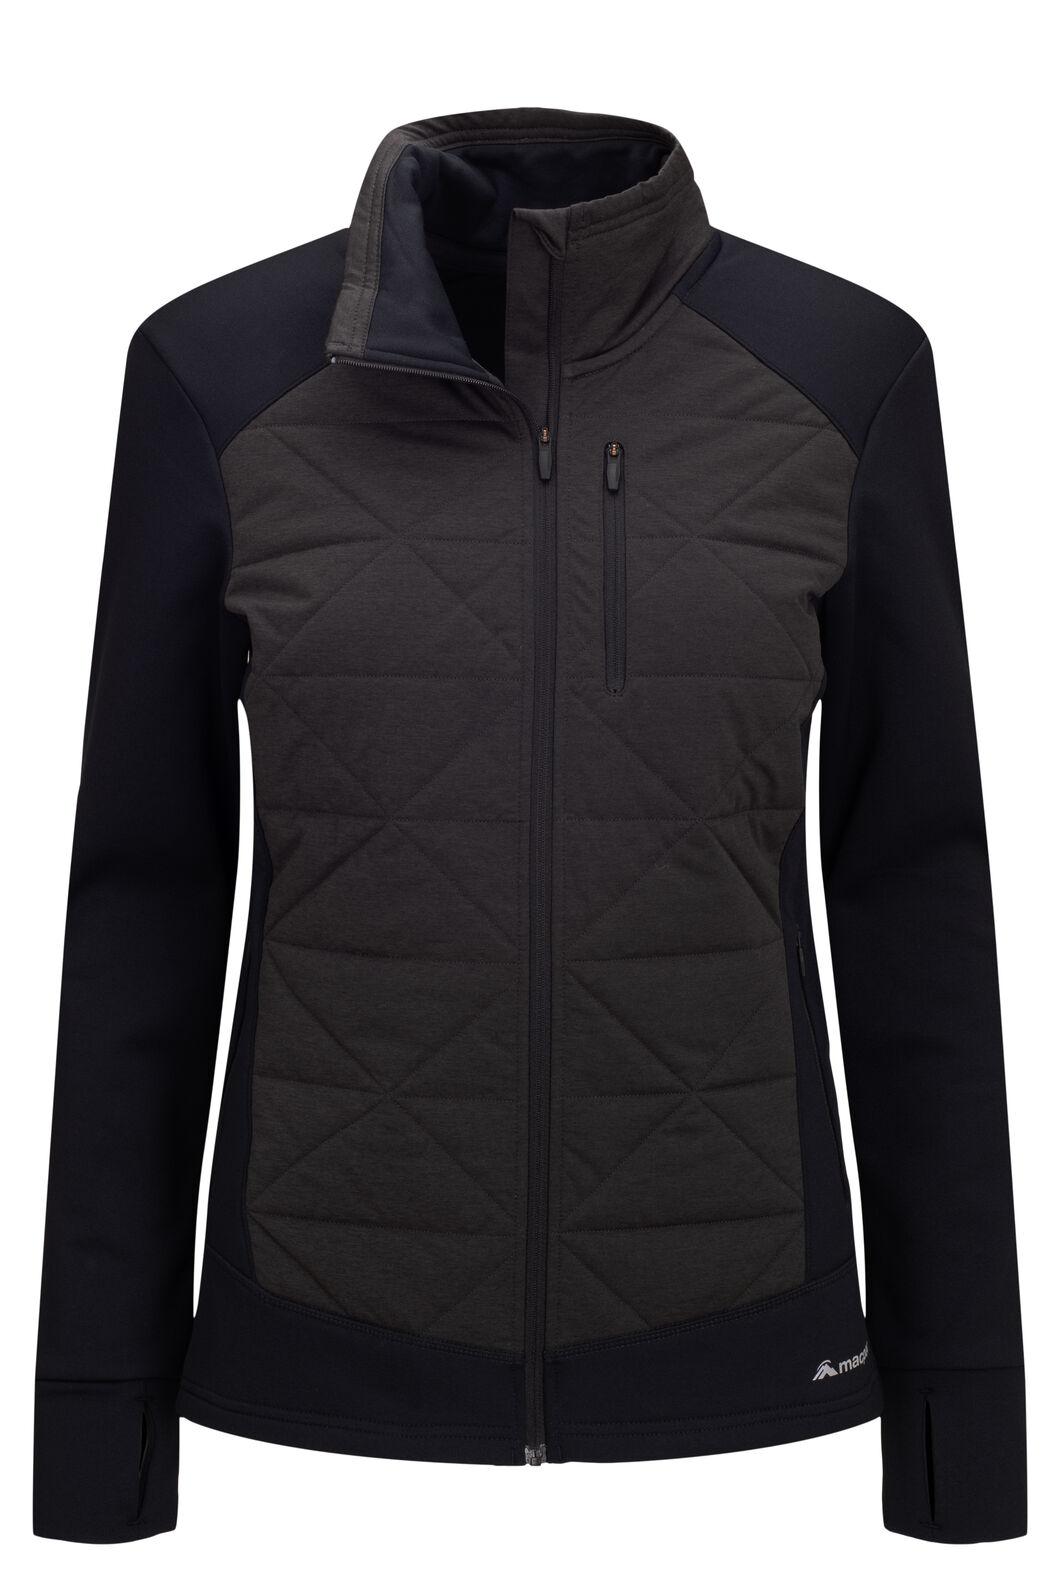 Macpac Women's Accelerate PrimaLoft® Fleece Jacket, Black, hi-res